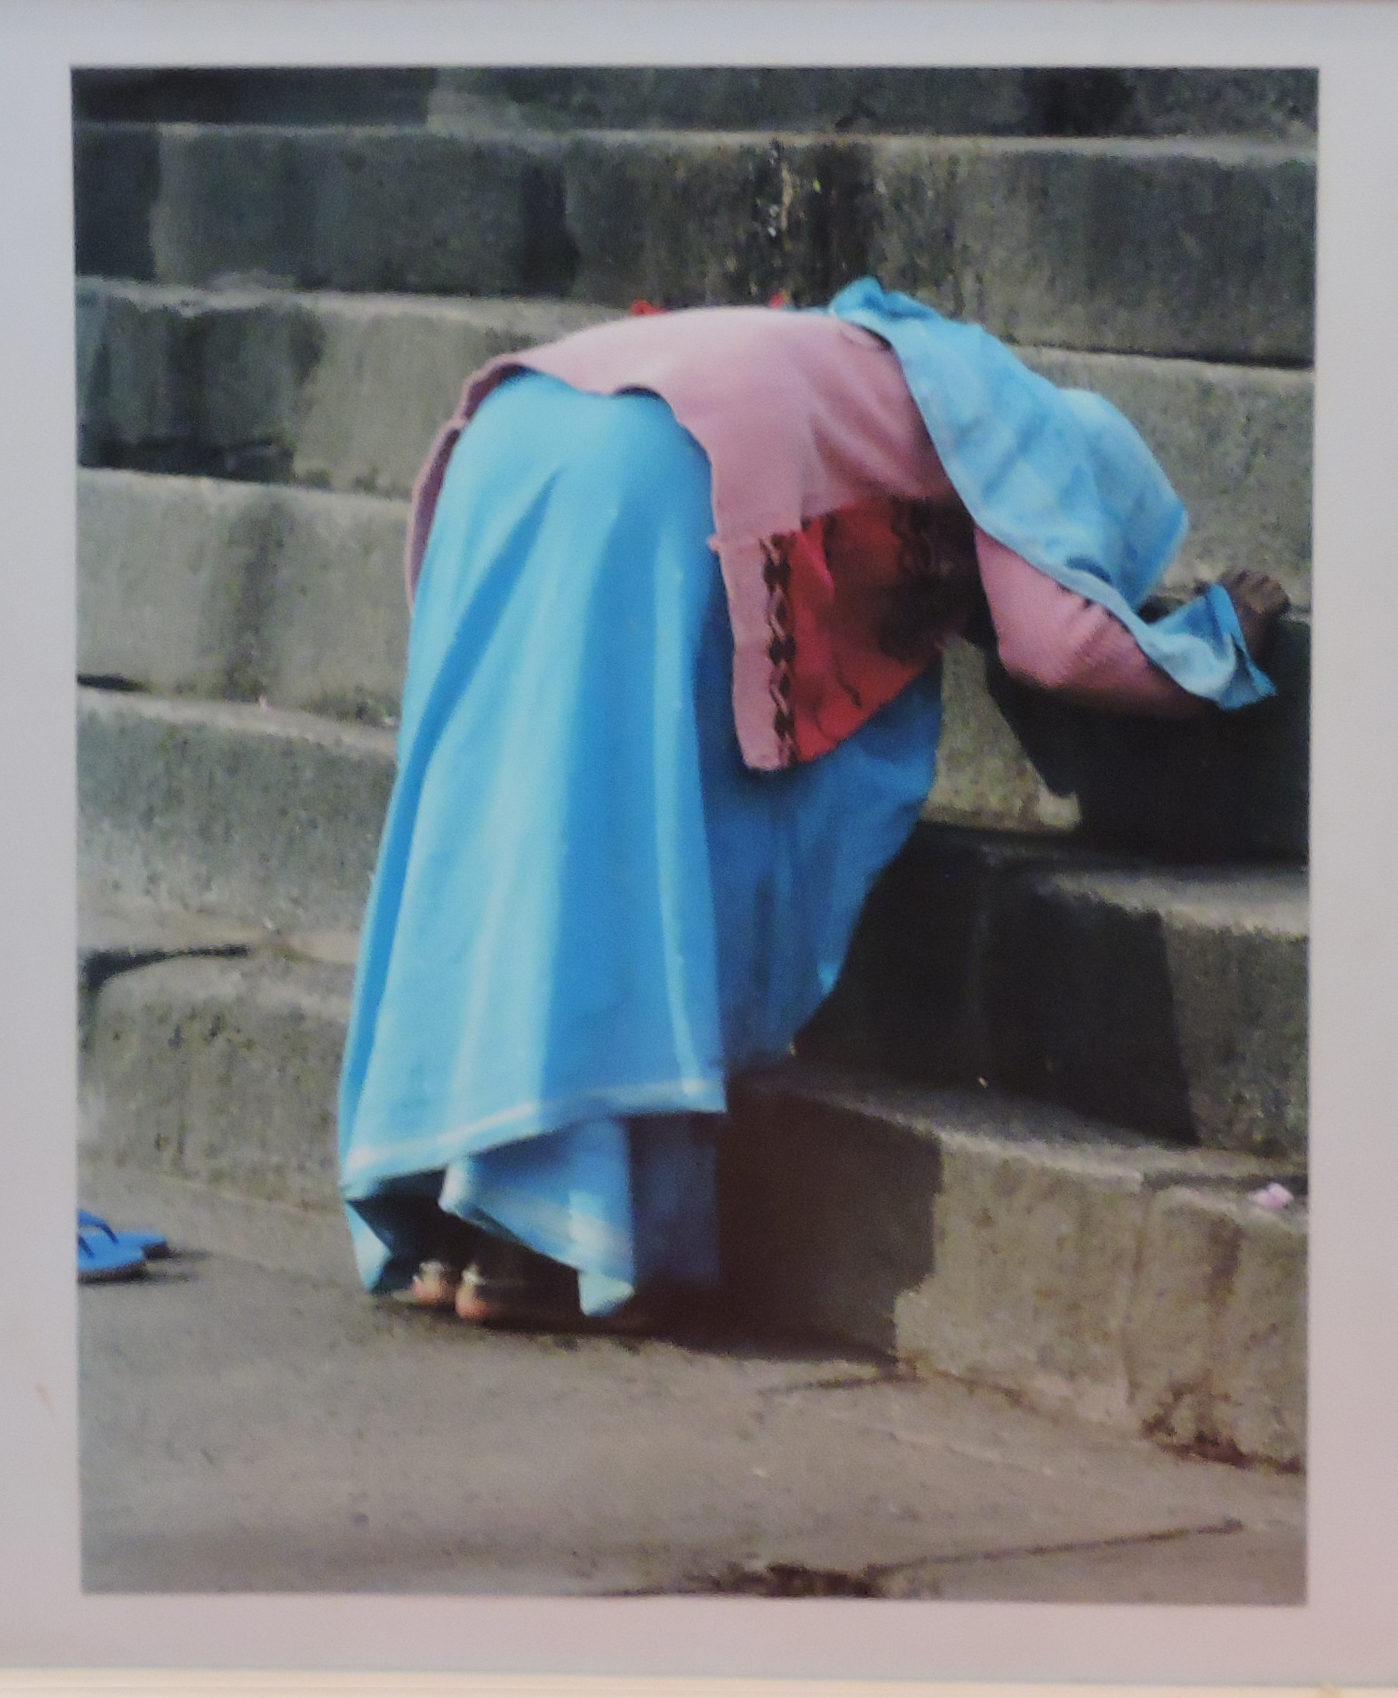 Mira_Bischoff_-_Mulher_de_azul_curvada,_Índia,_2006._Papel_fotográfico,_40x30